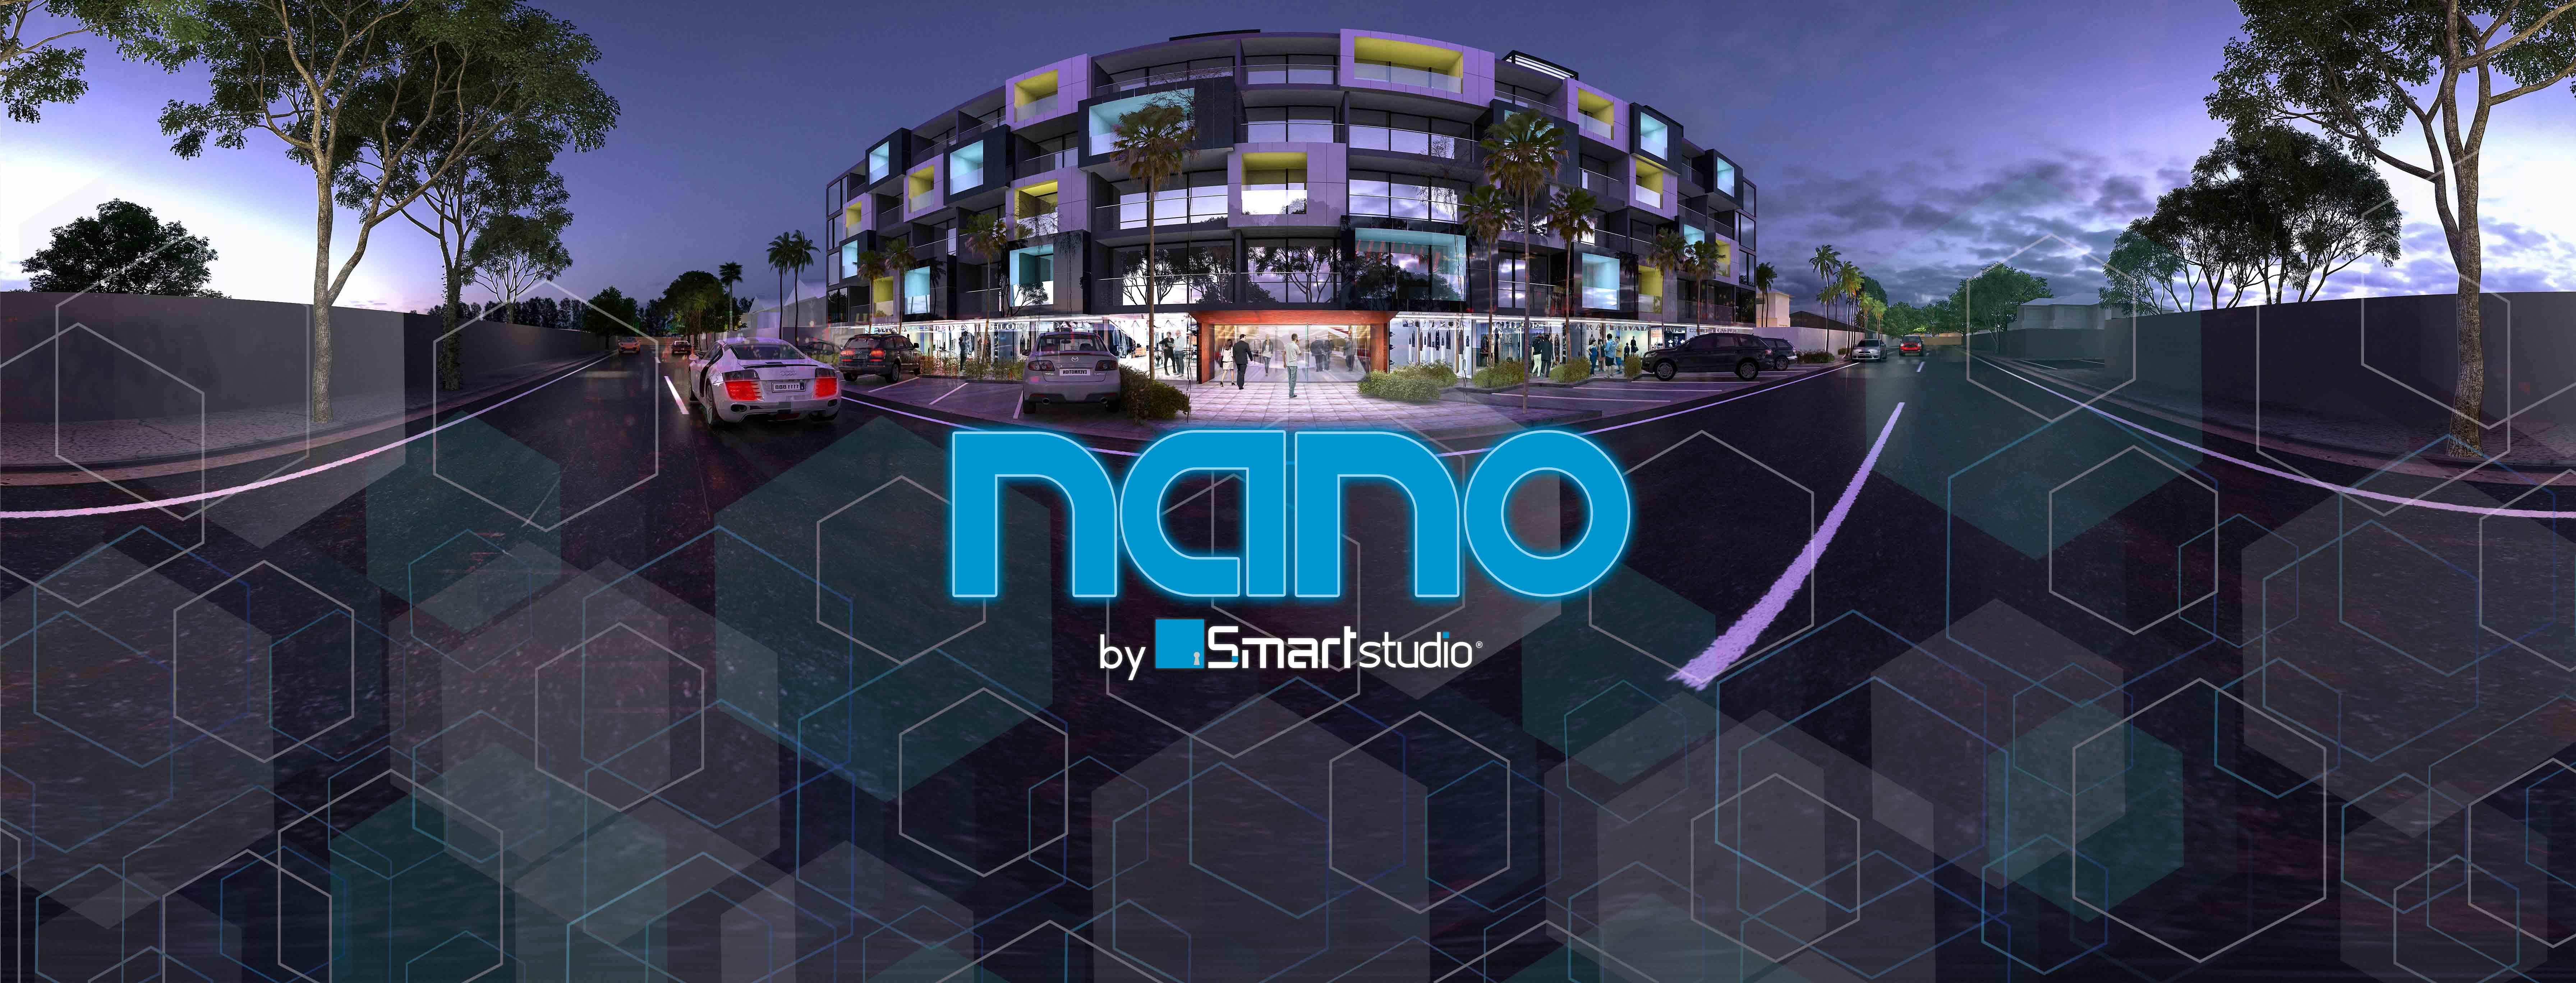 Nano by Smartstudio Foto 1